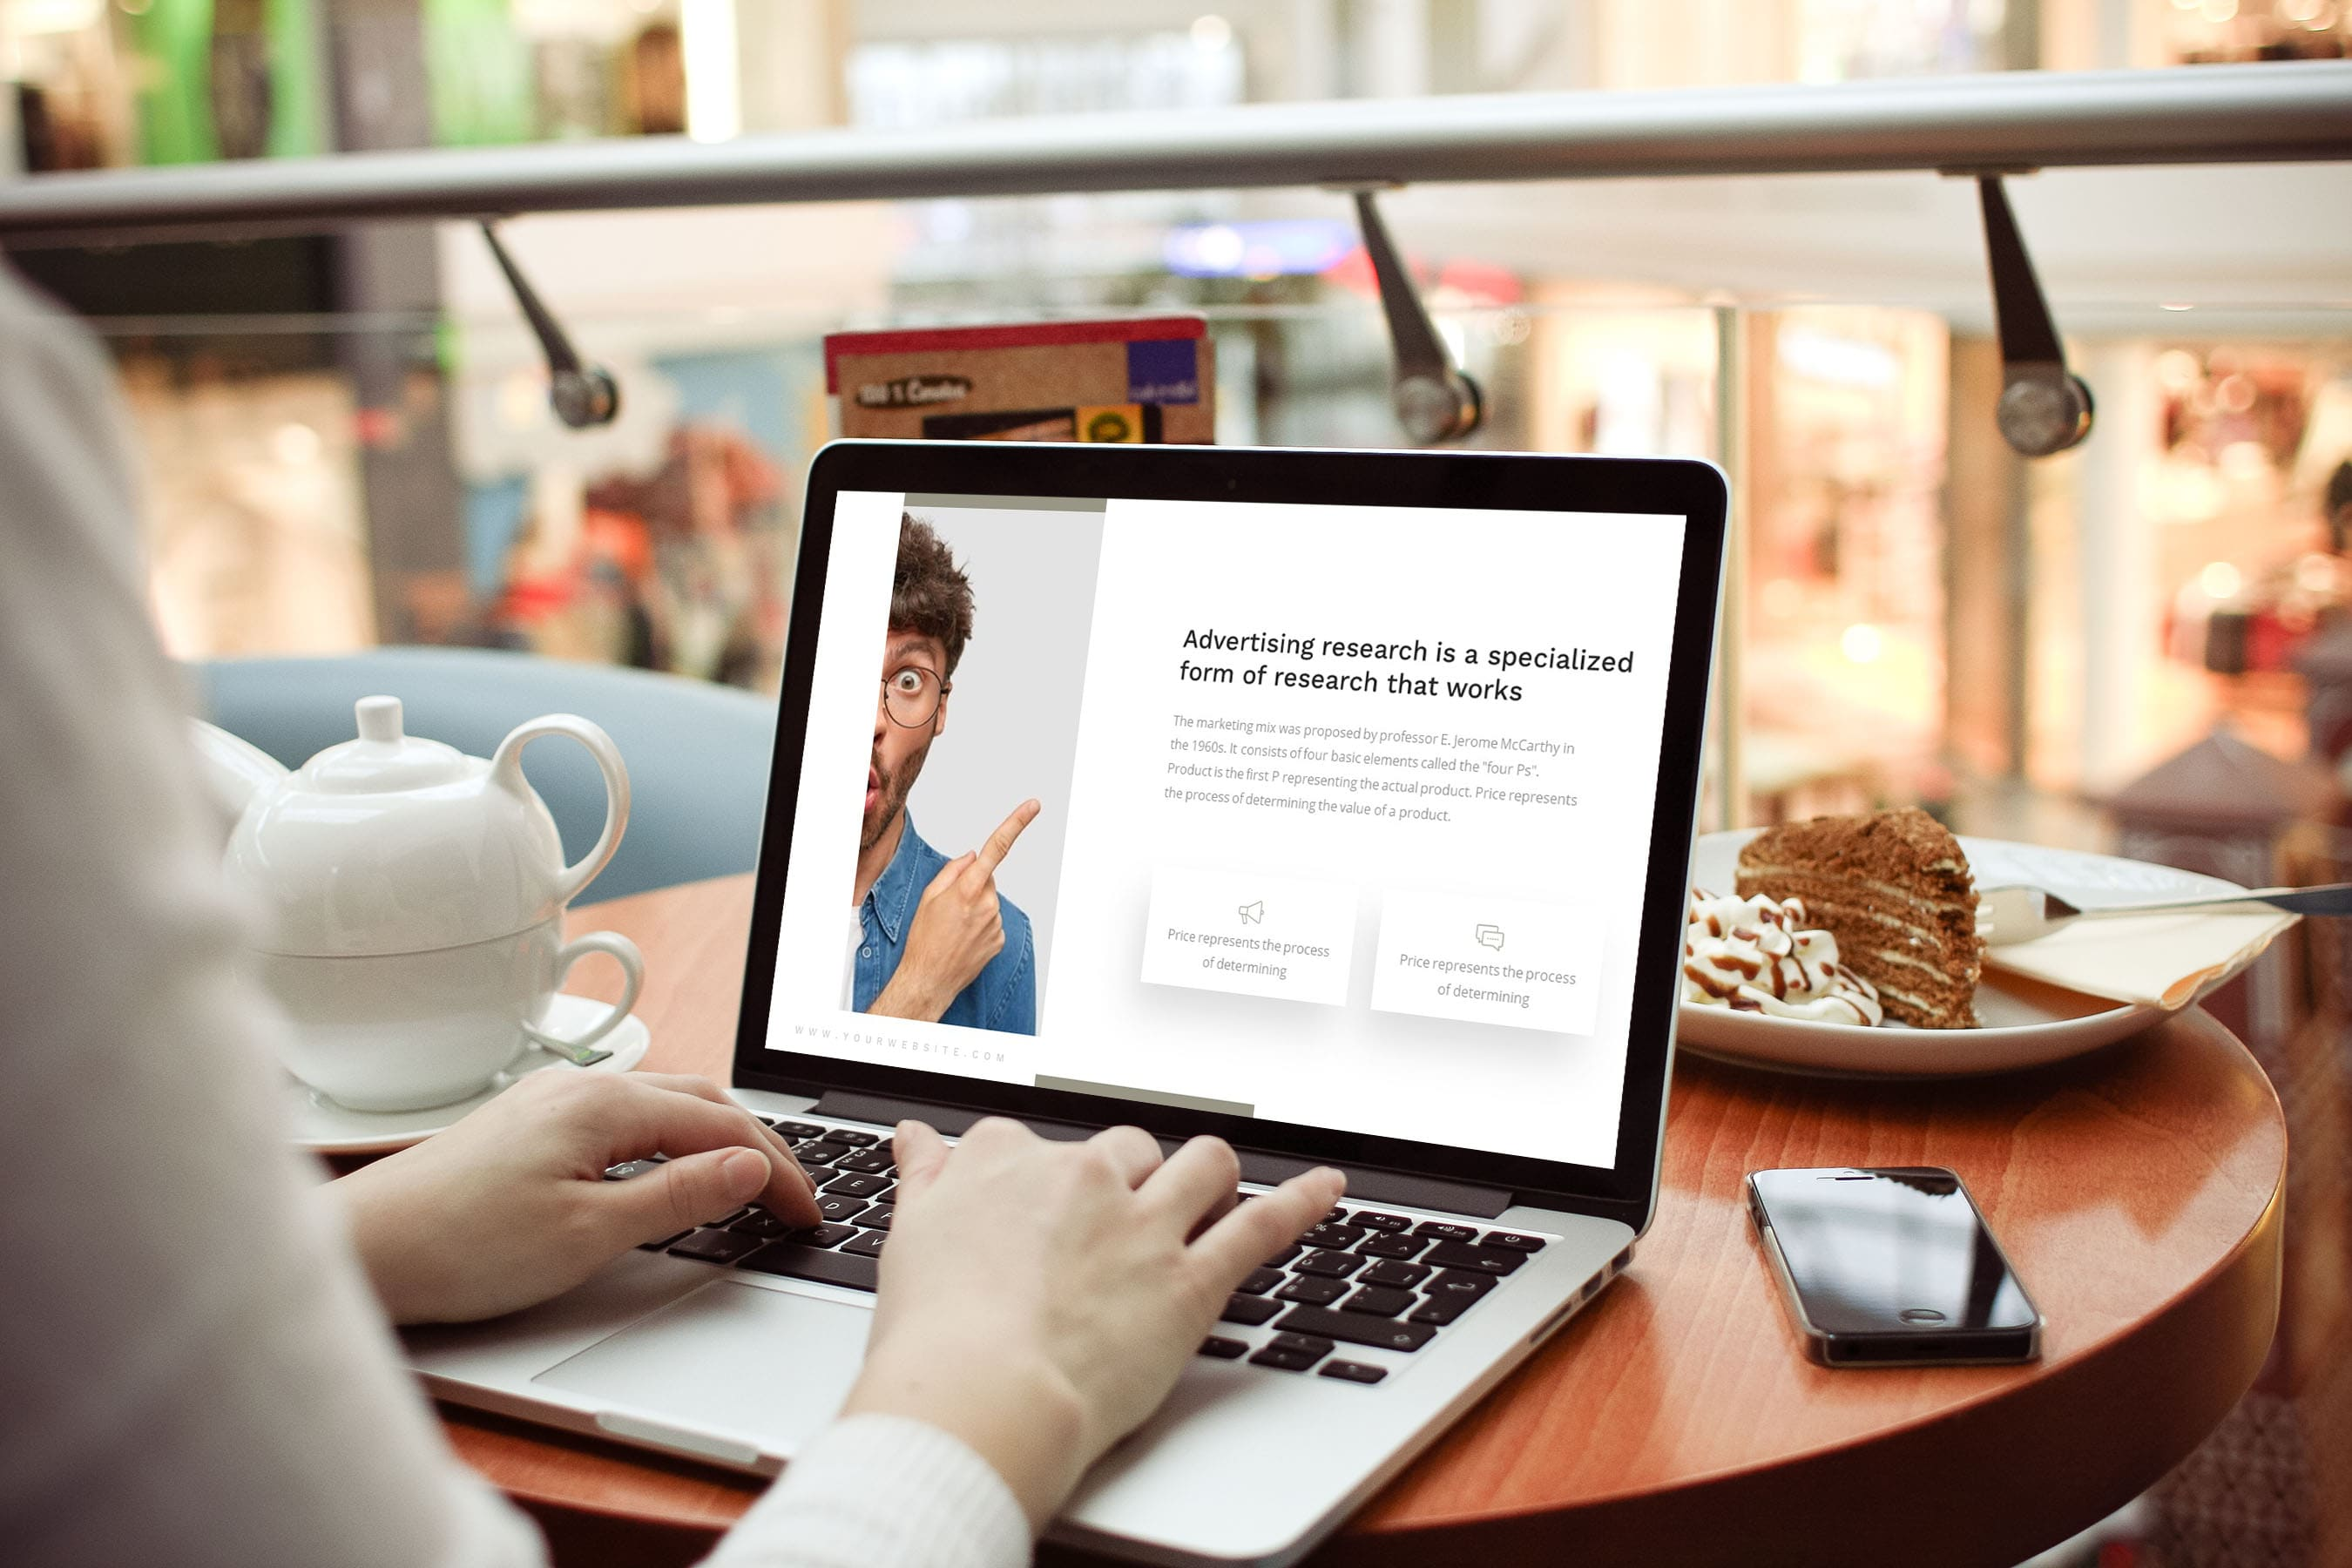 Advertising Presentation by MasterBundles notebook preview mockup image.